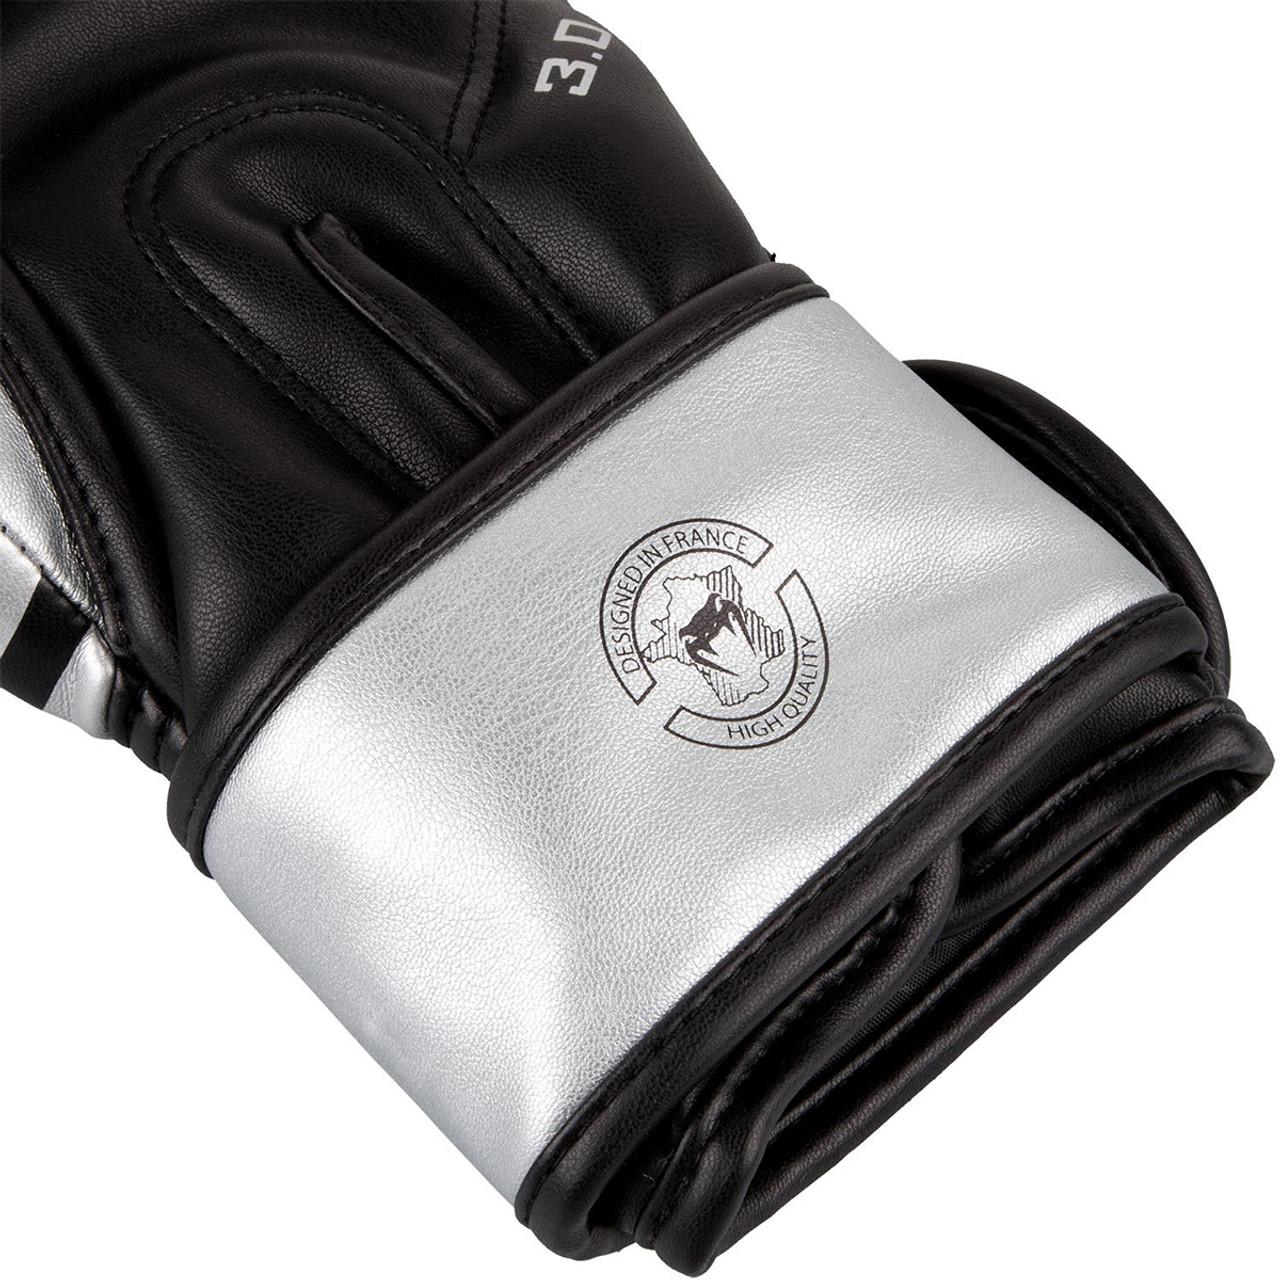 Venum Challenger 3 0 Training Boxing Gloves - Black/Silver